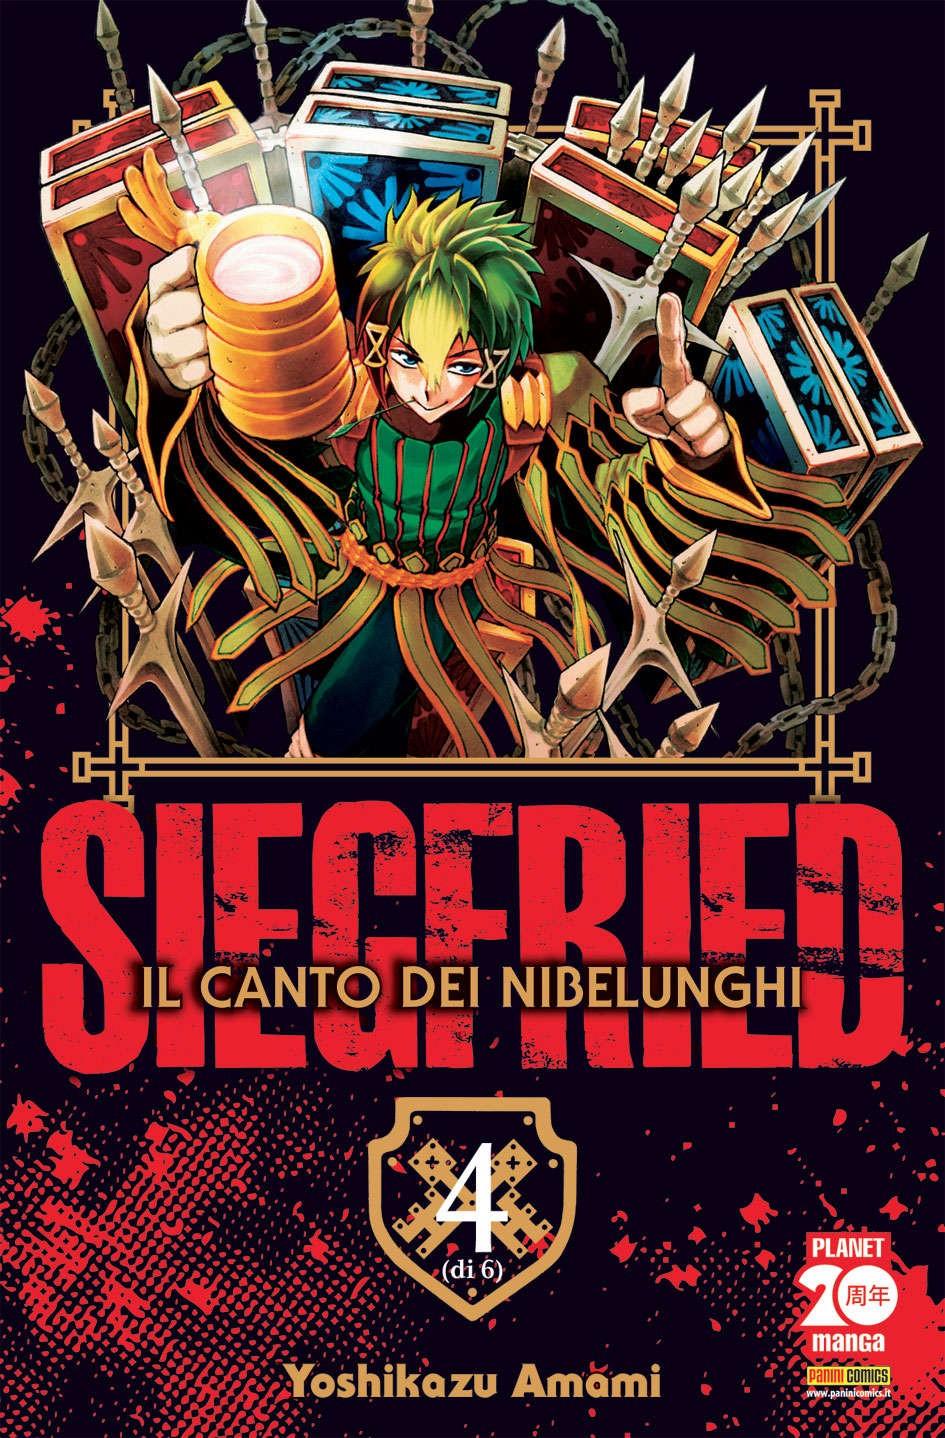 Siegfried - N° 4 - Il Canto Dei Nibelunghi (M6) - Sakura Planet Manga